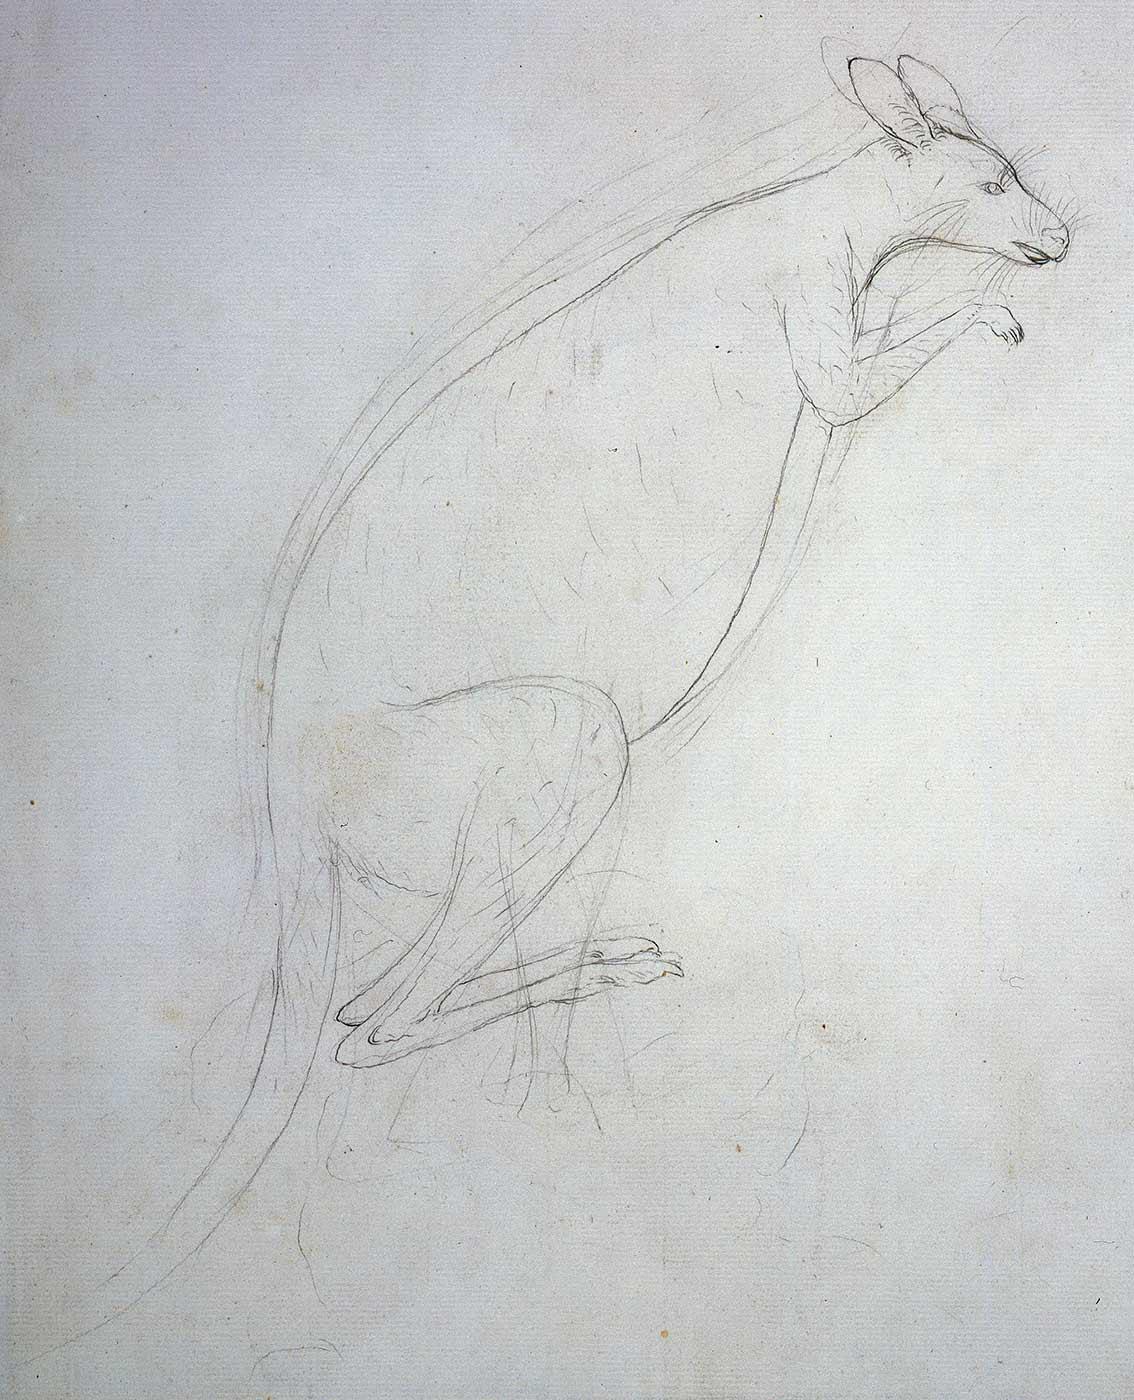 Sketch of a kangaroo. - click to view larger image